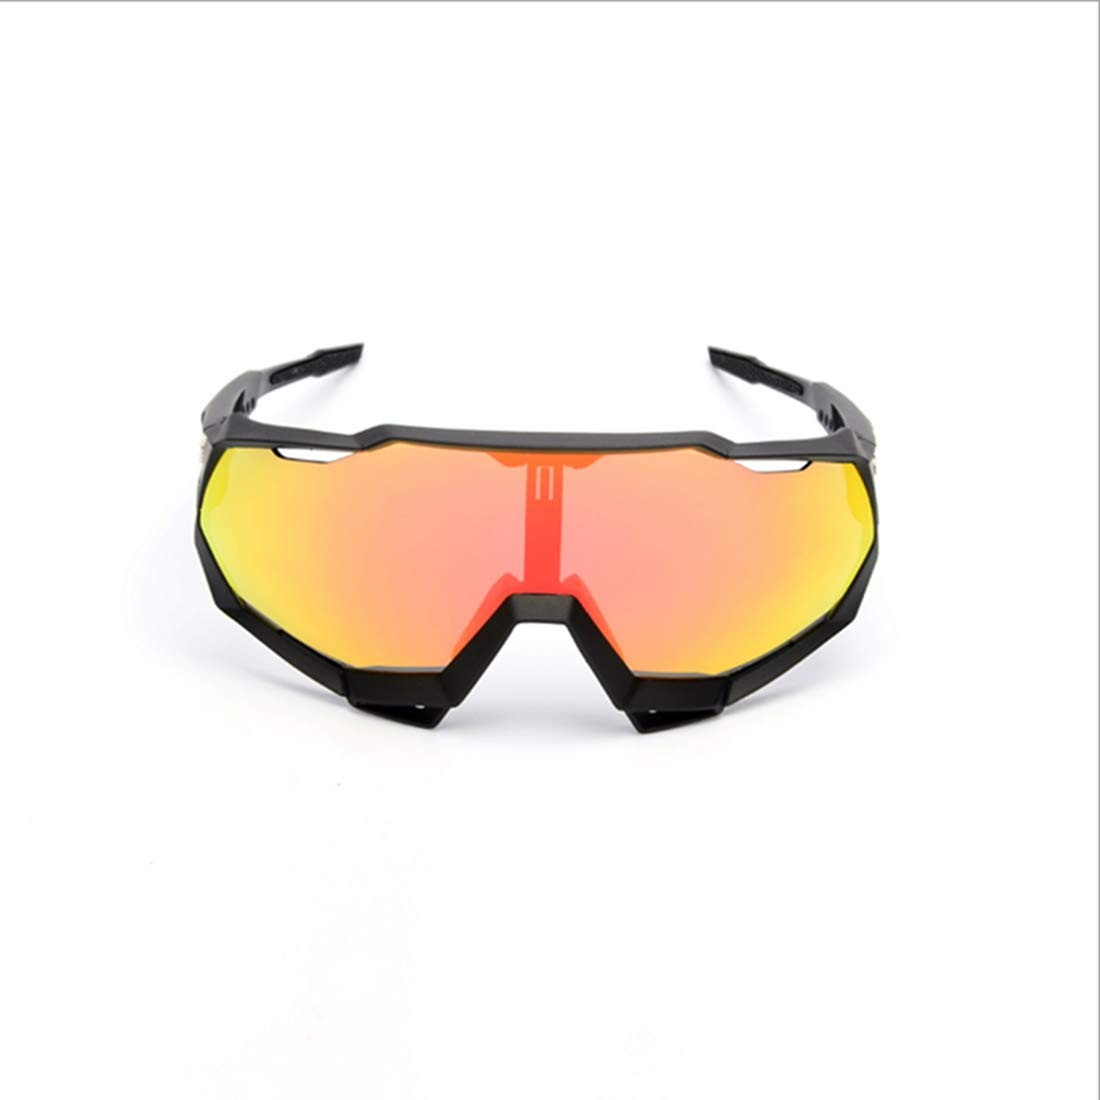 MAGAI Gran Espejo de Lentes Intercambiables Protección UV Gafas de Montar a Caballo (Color : Black Red)